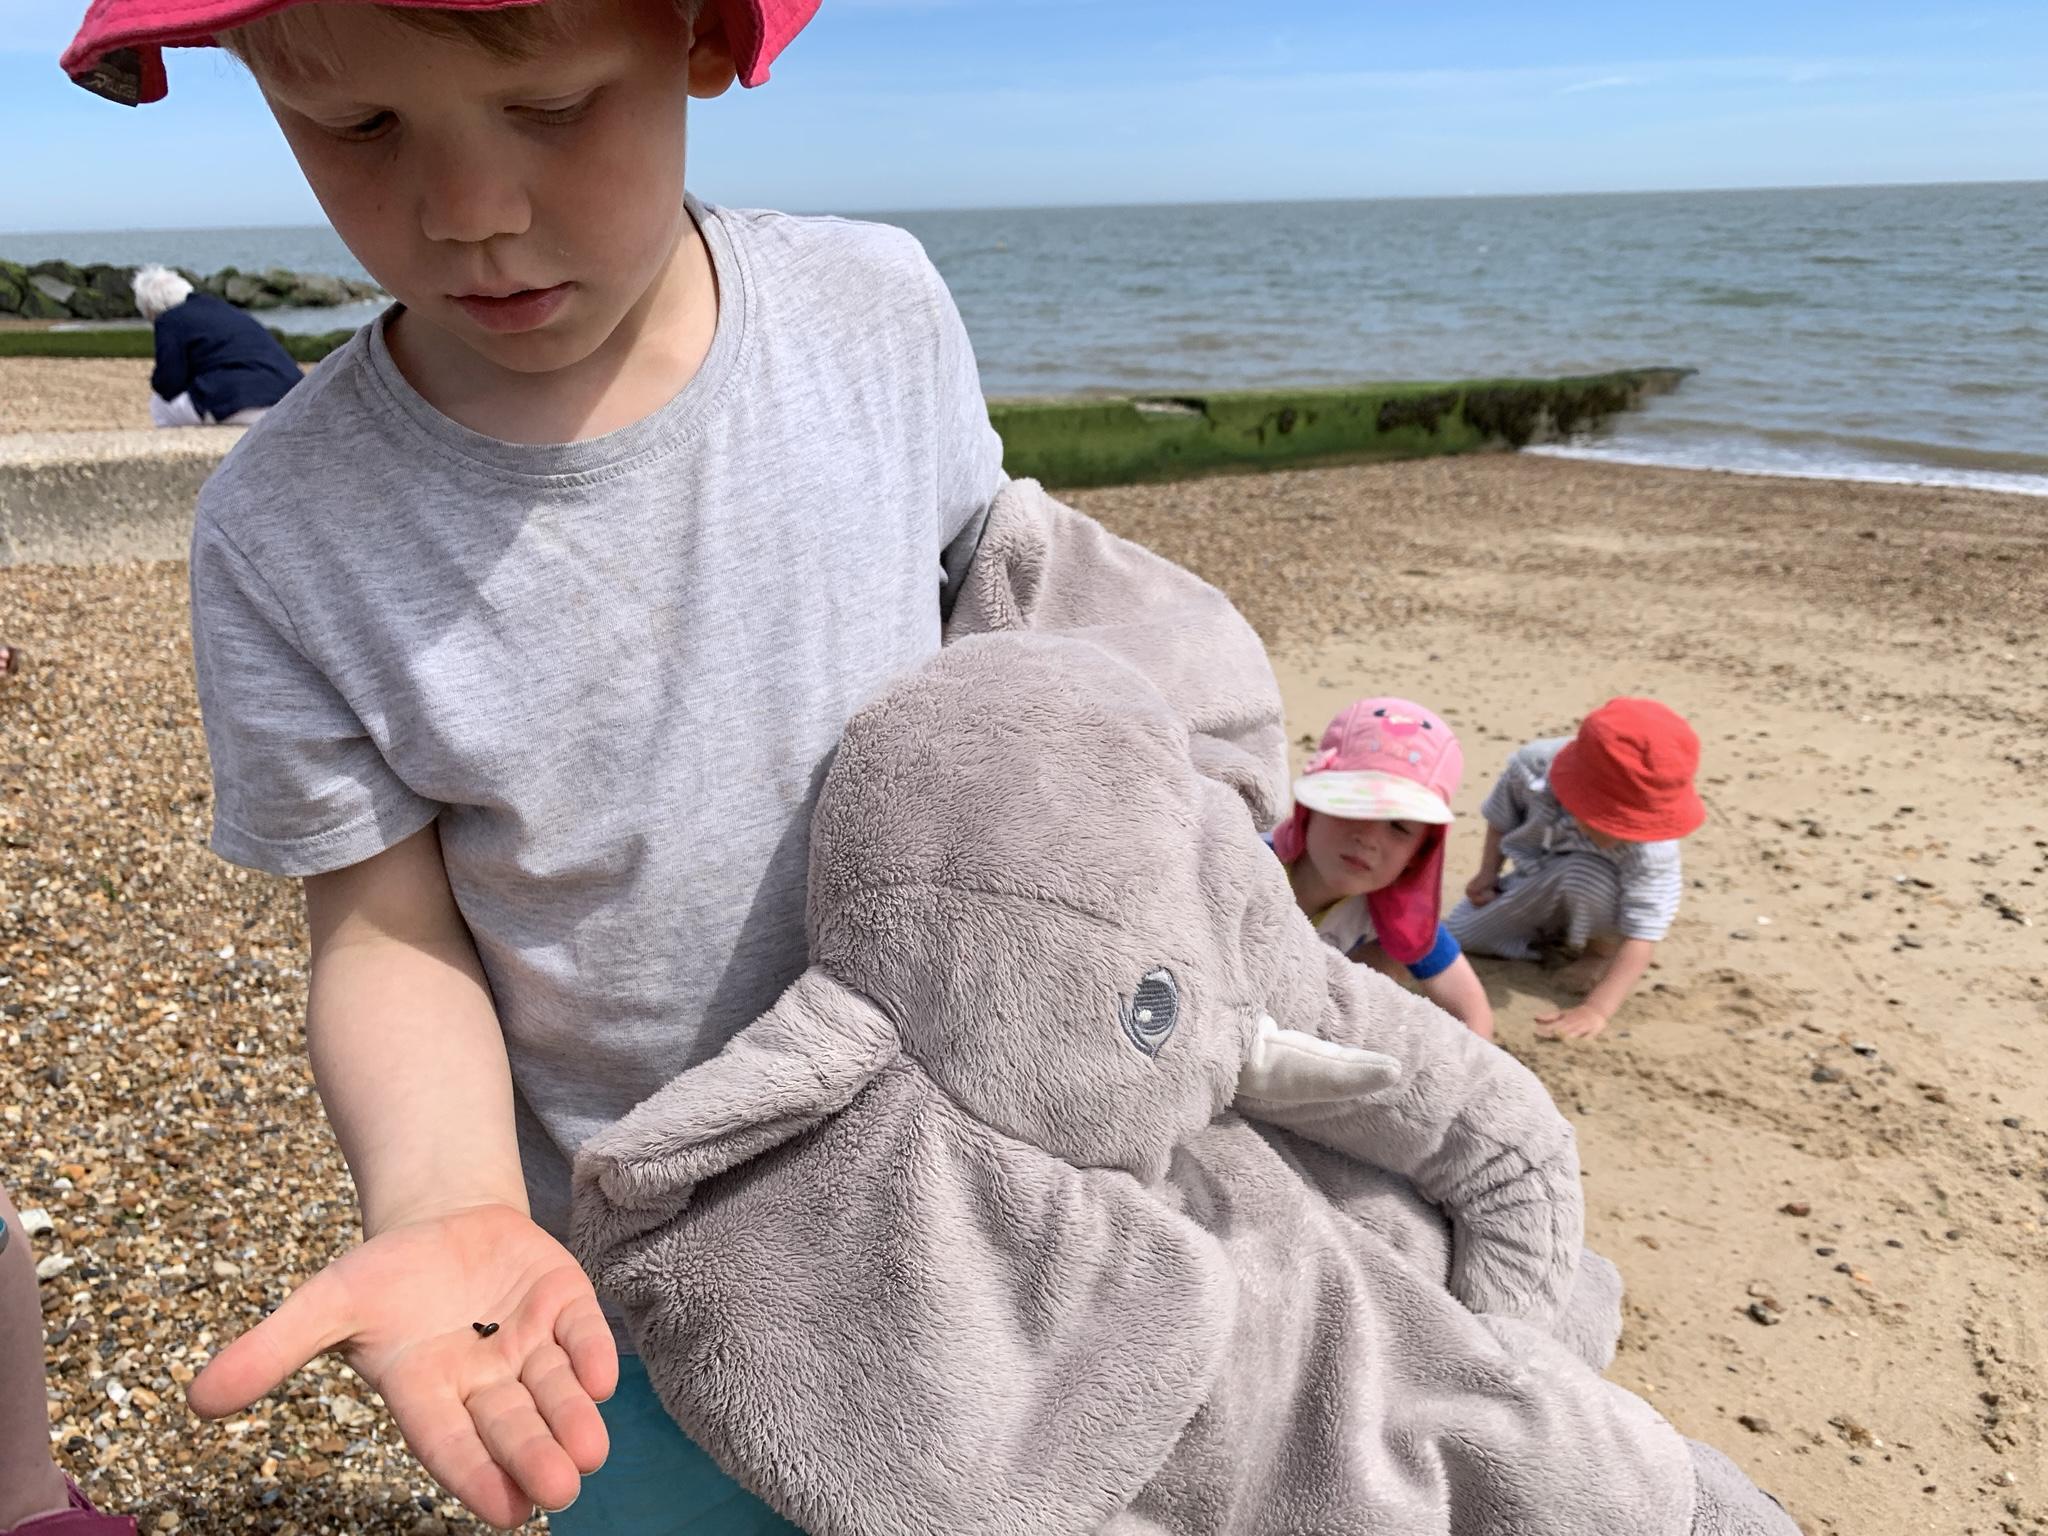 Beachcombing with kids, Shark's tooth Felixstowe Beach